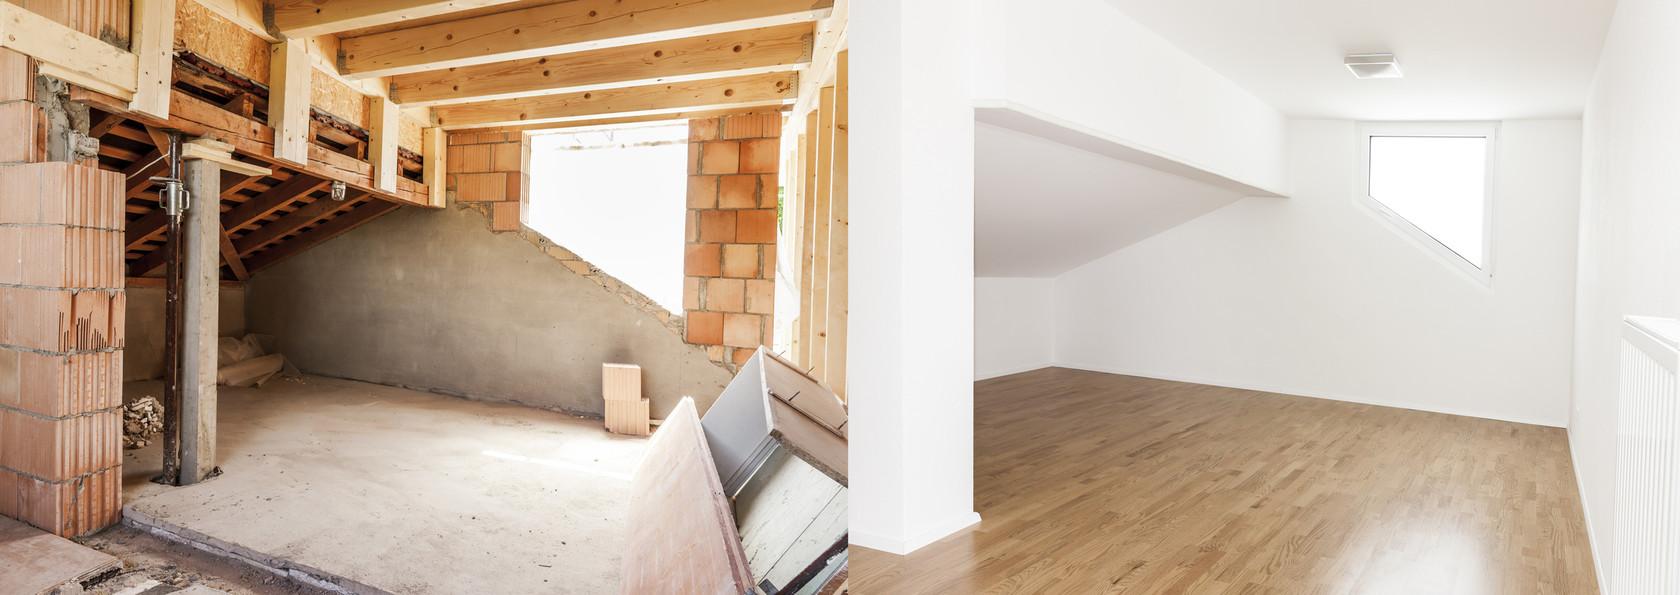 Altbausanierung Stuttgart husovic modernisierung altbausanierung und renovierung in stuttgart